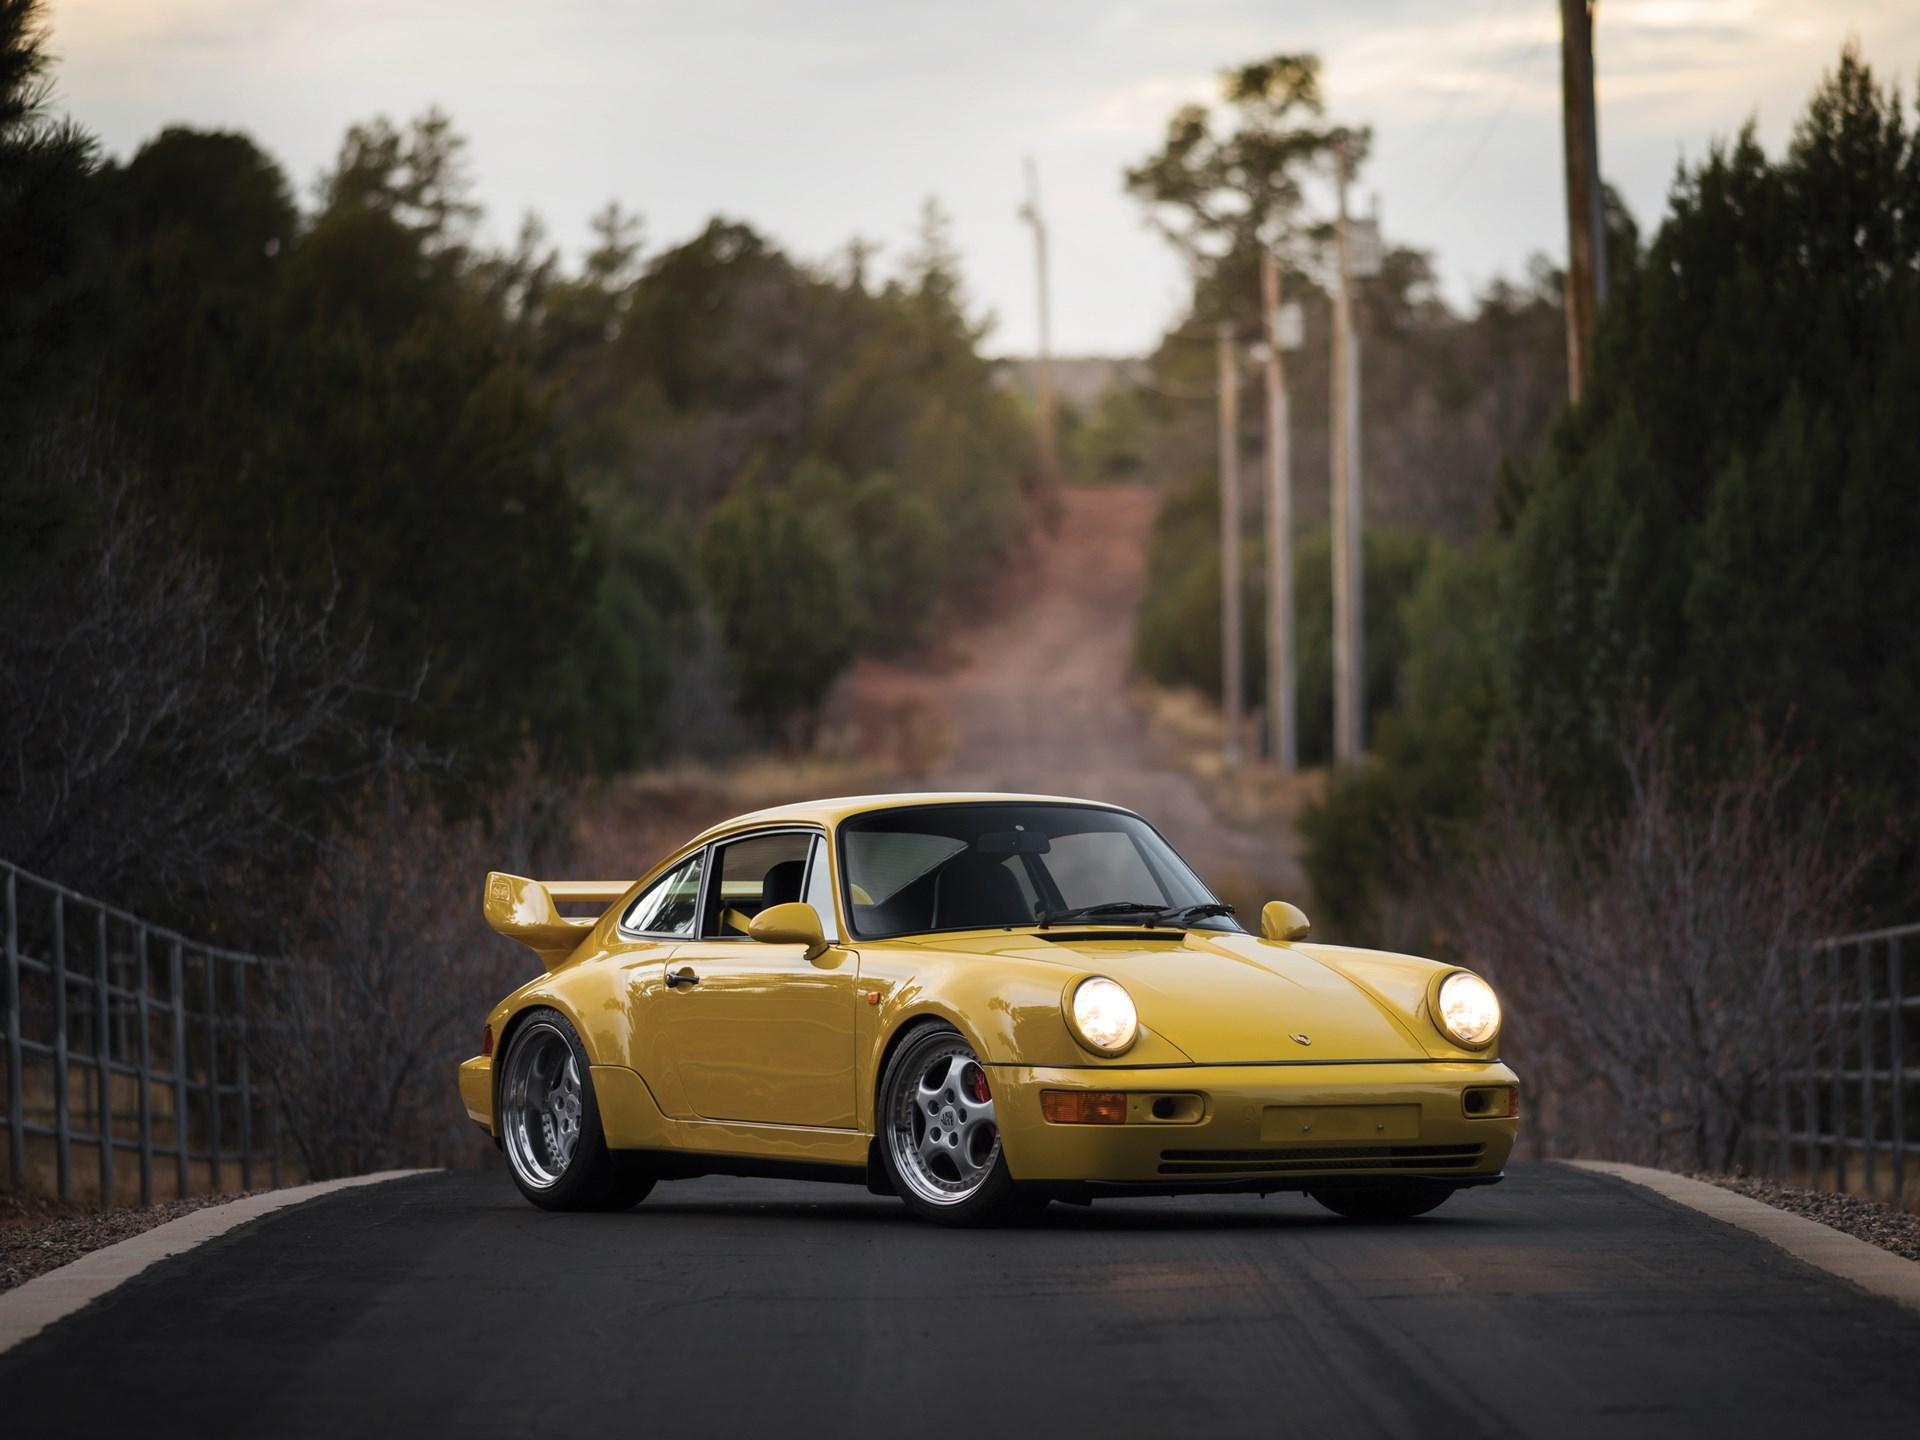 1993 Porsche 911 Carrera RS 3.8